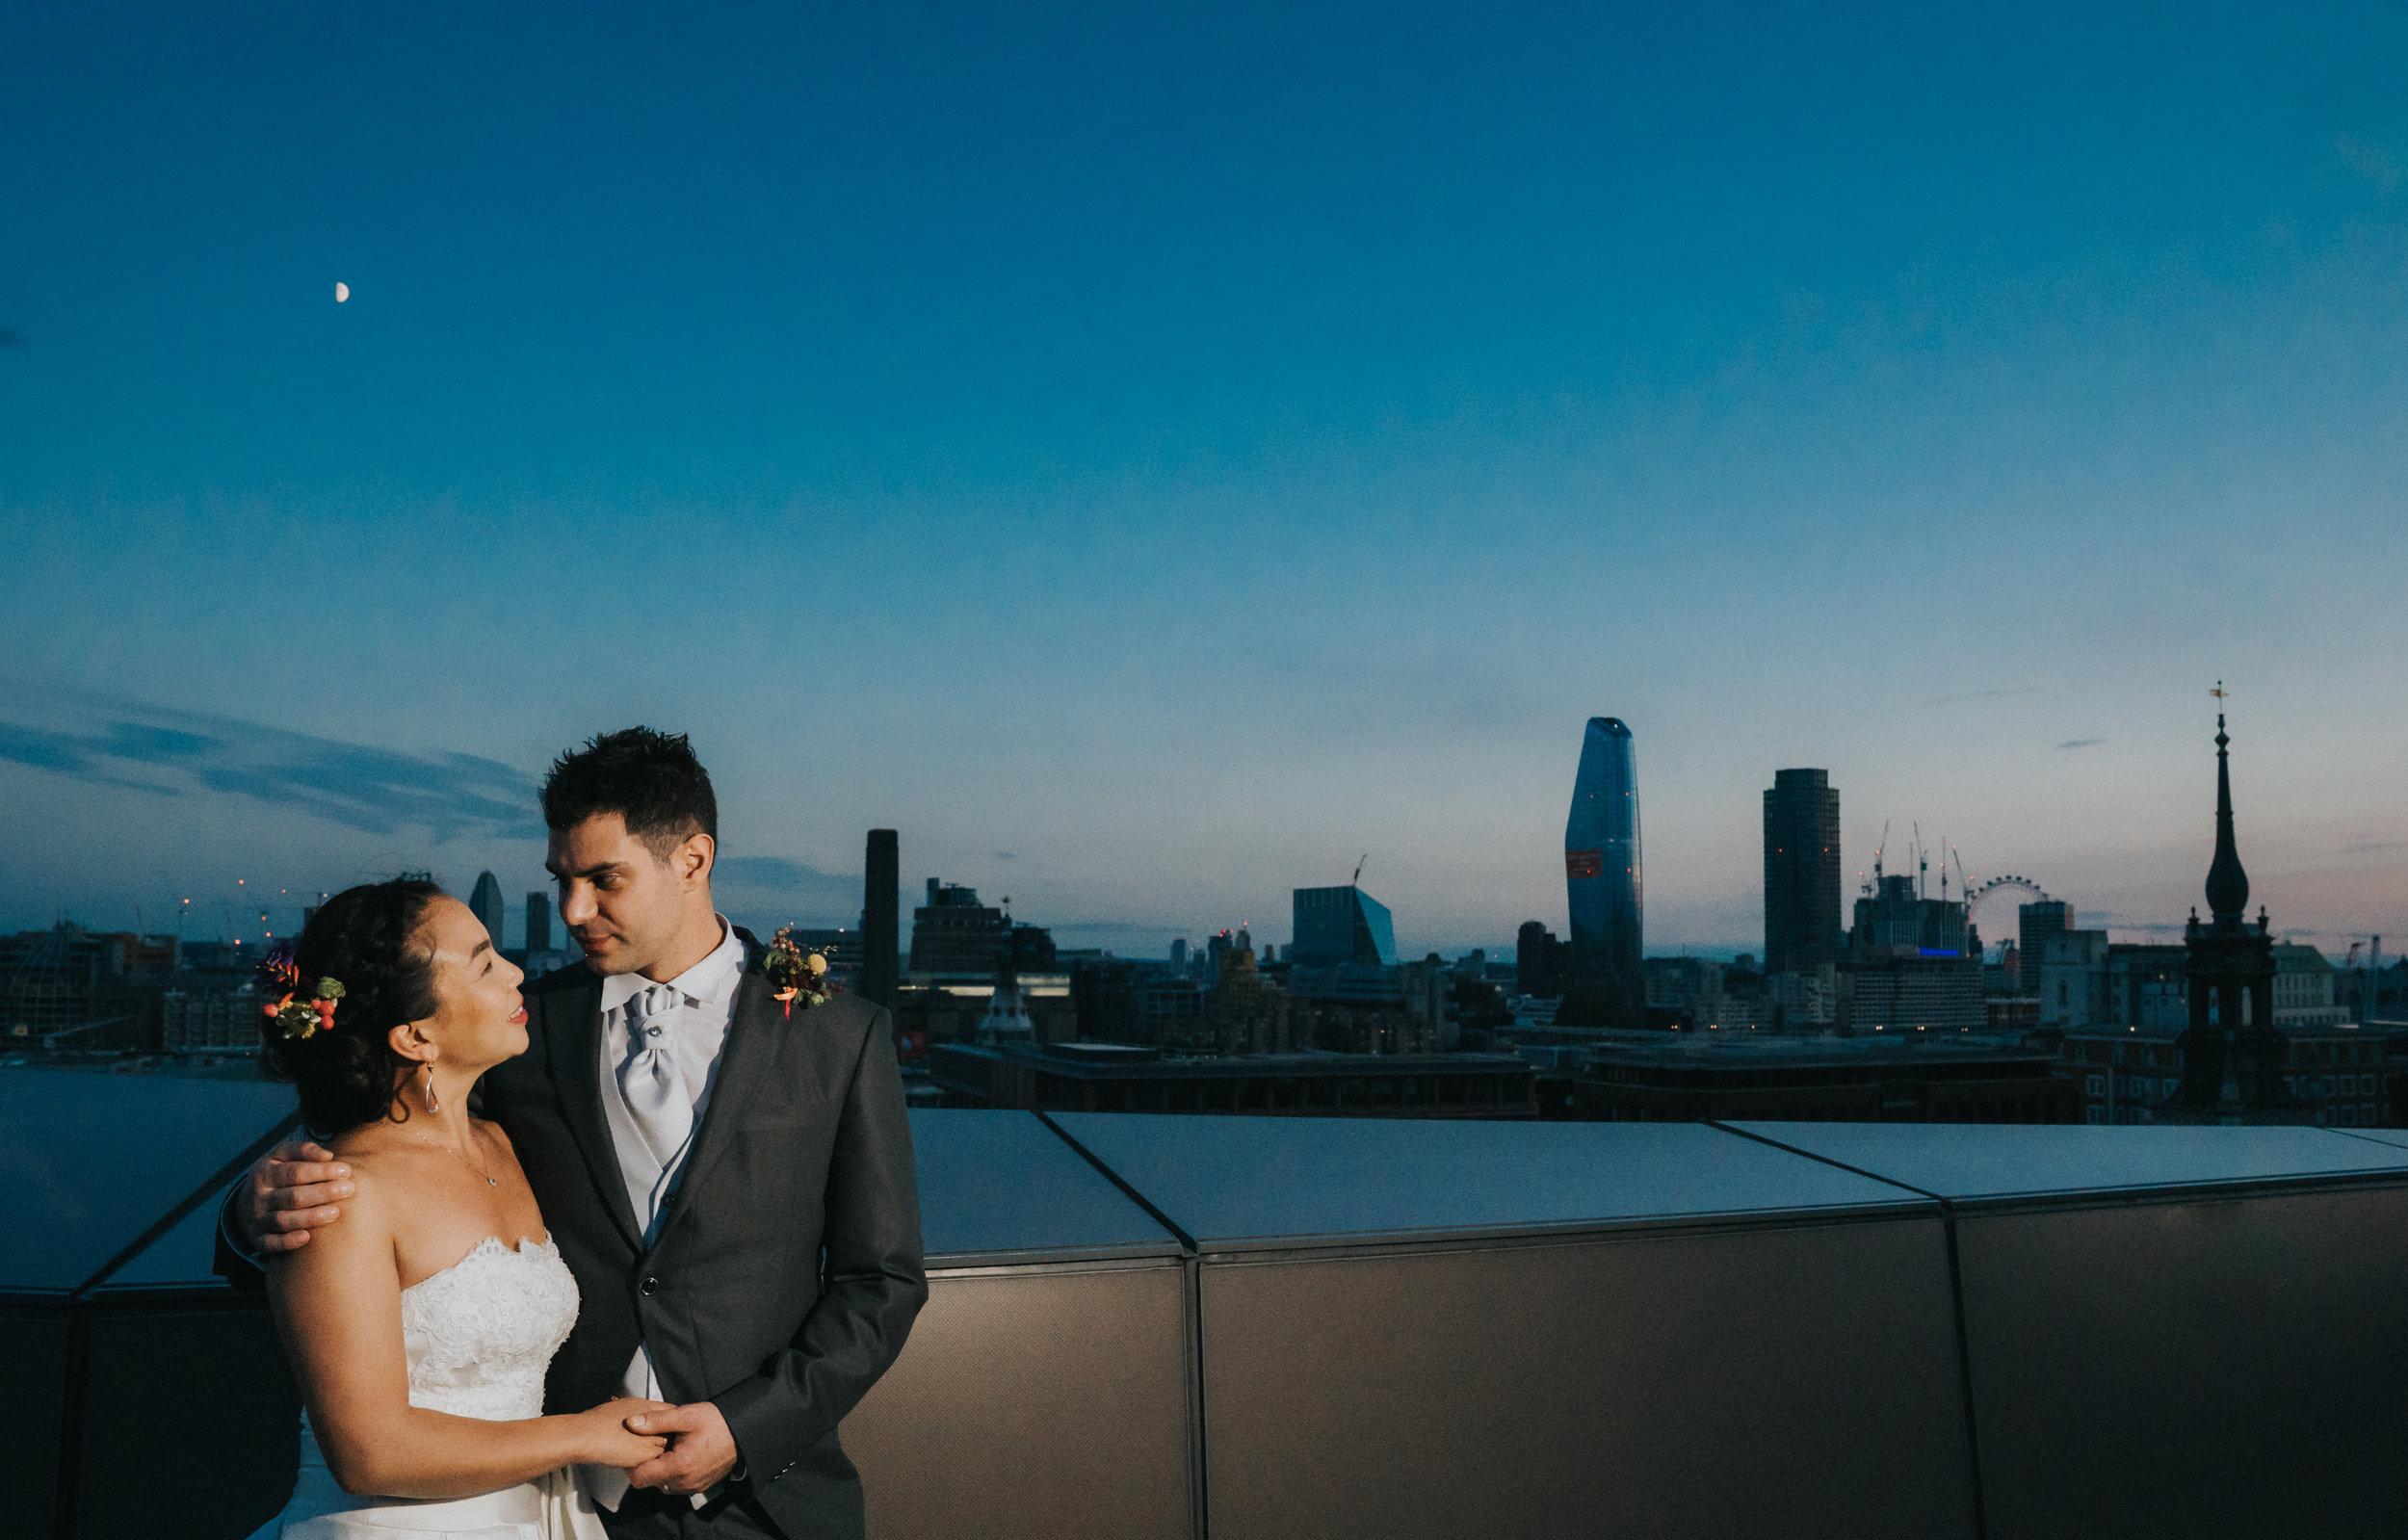 river-rooms-tower-bridge-london-stpauls-mondrian-hotel-wedding-photography-videography-75